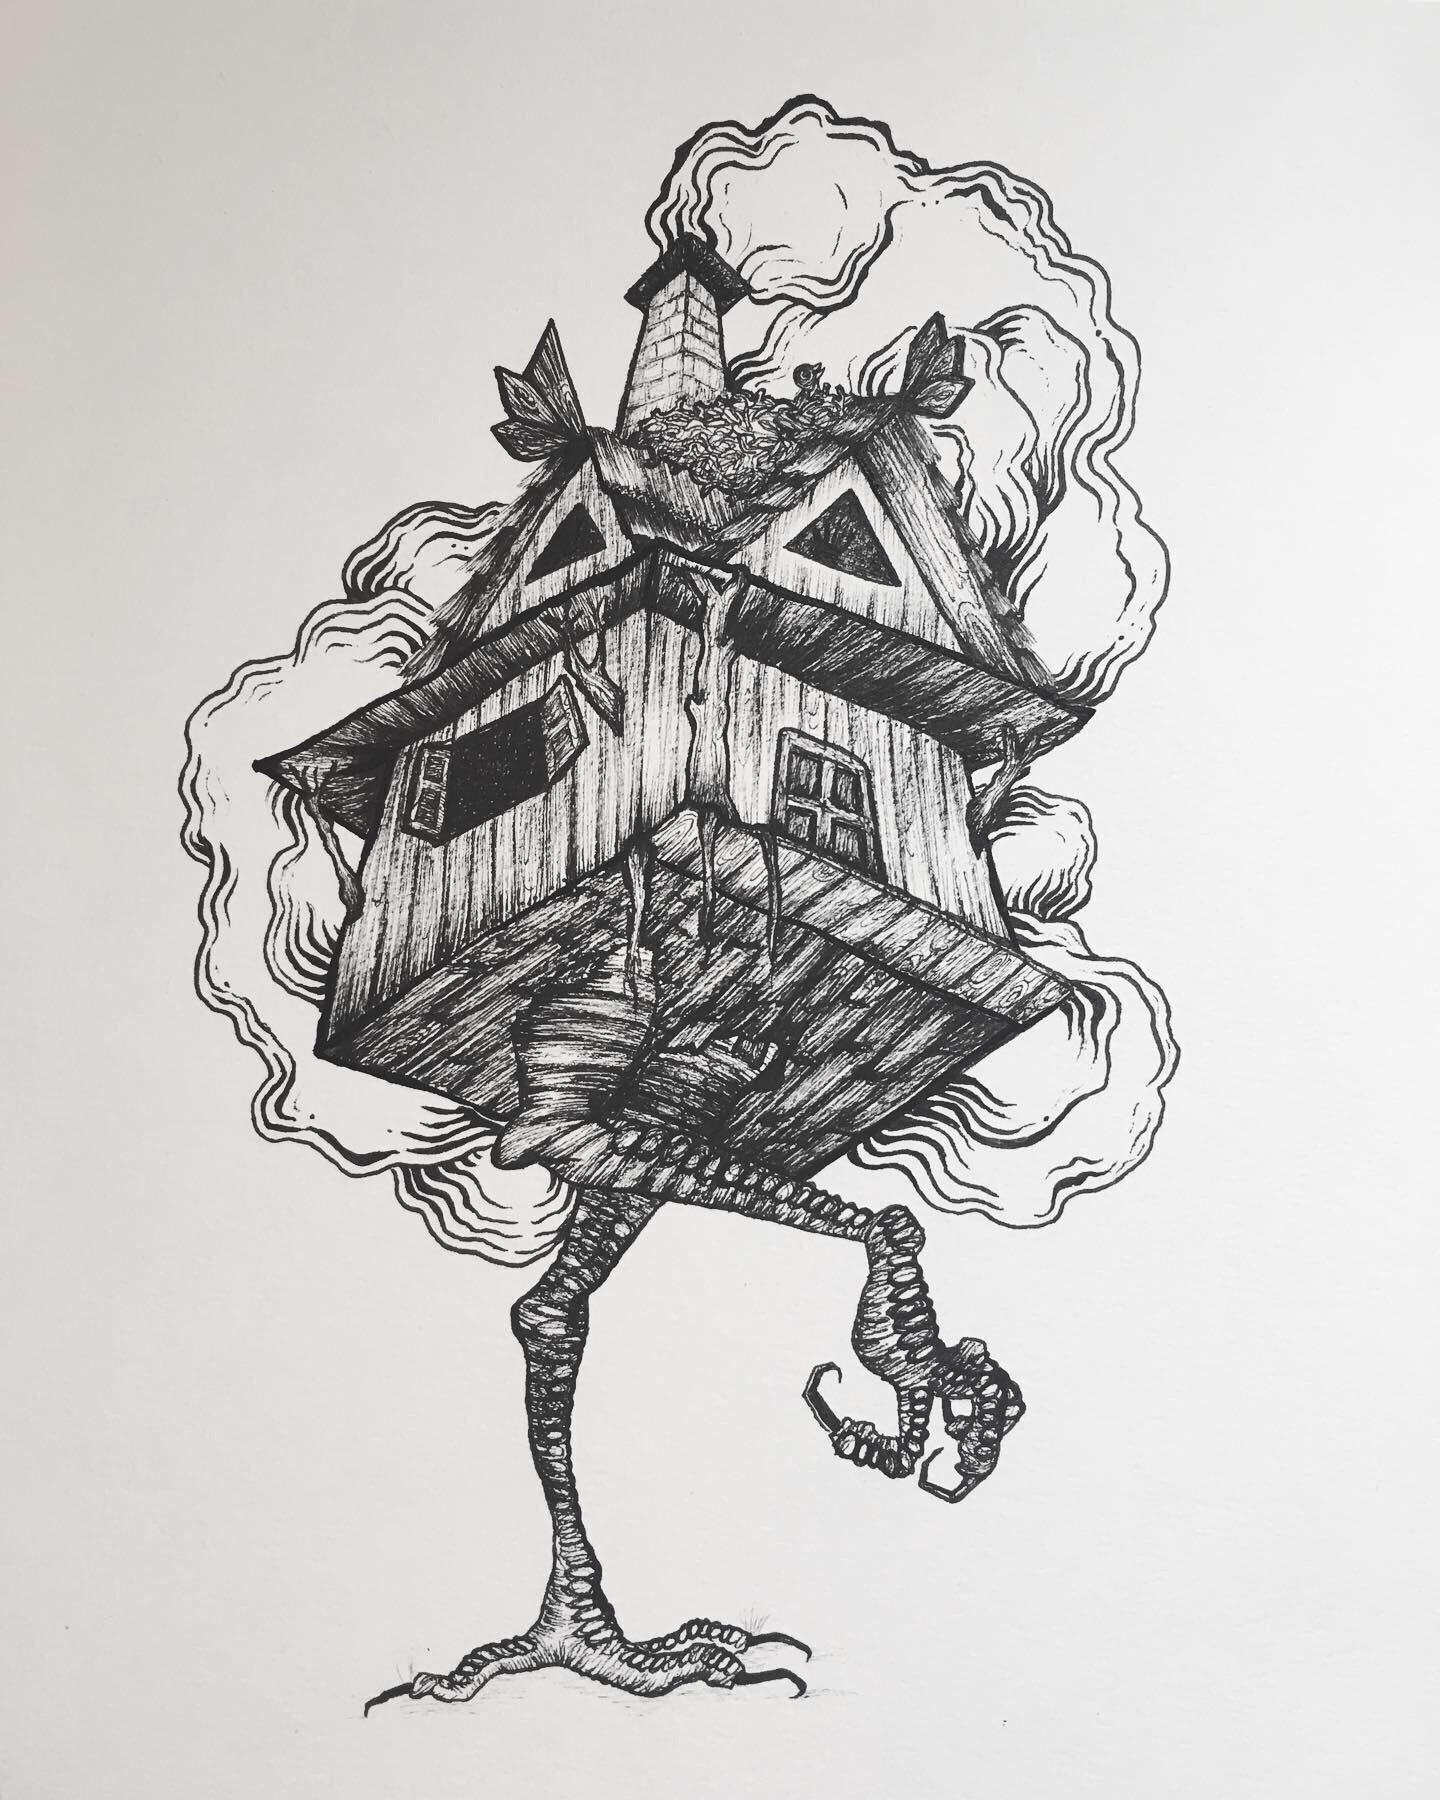 The House Of Baba Yaga Ink On Paper What Do You Think Lilmoonrock Art Inspiration Folk Illustration Baba Yaga